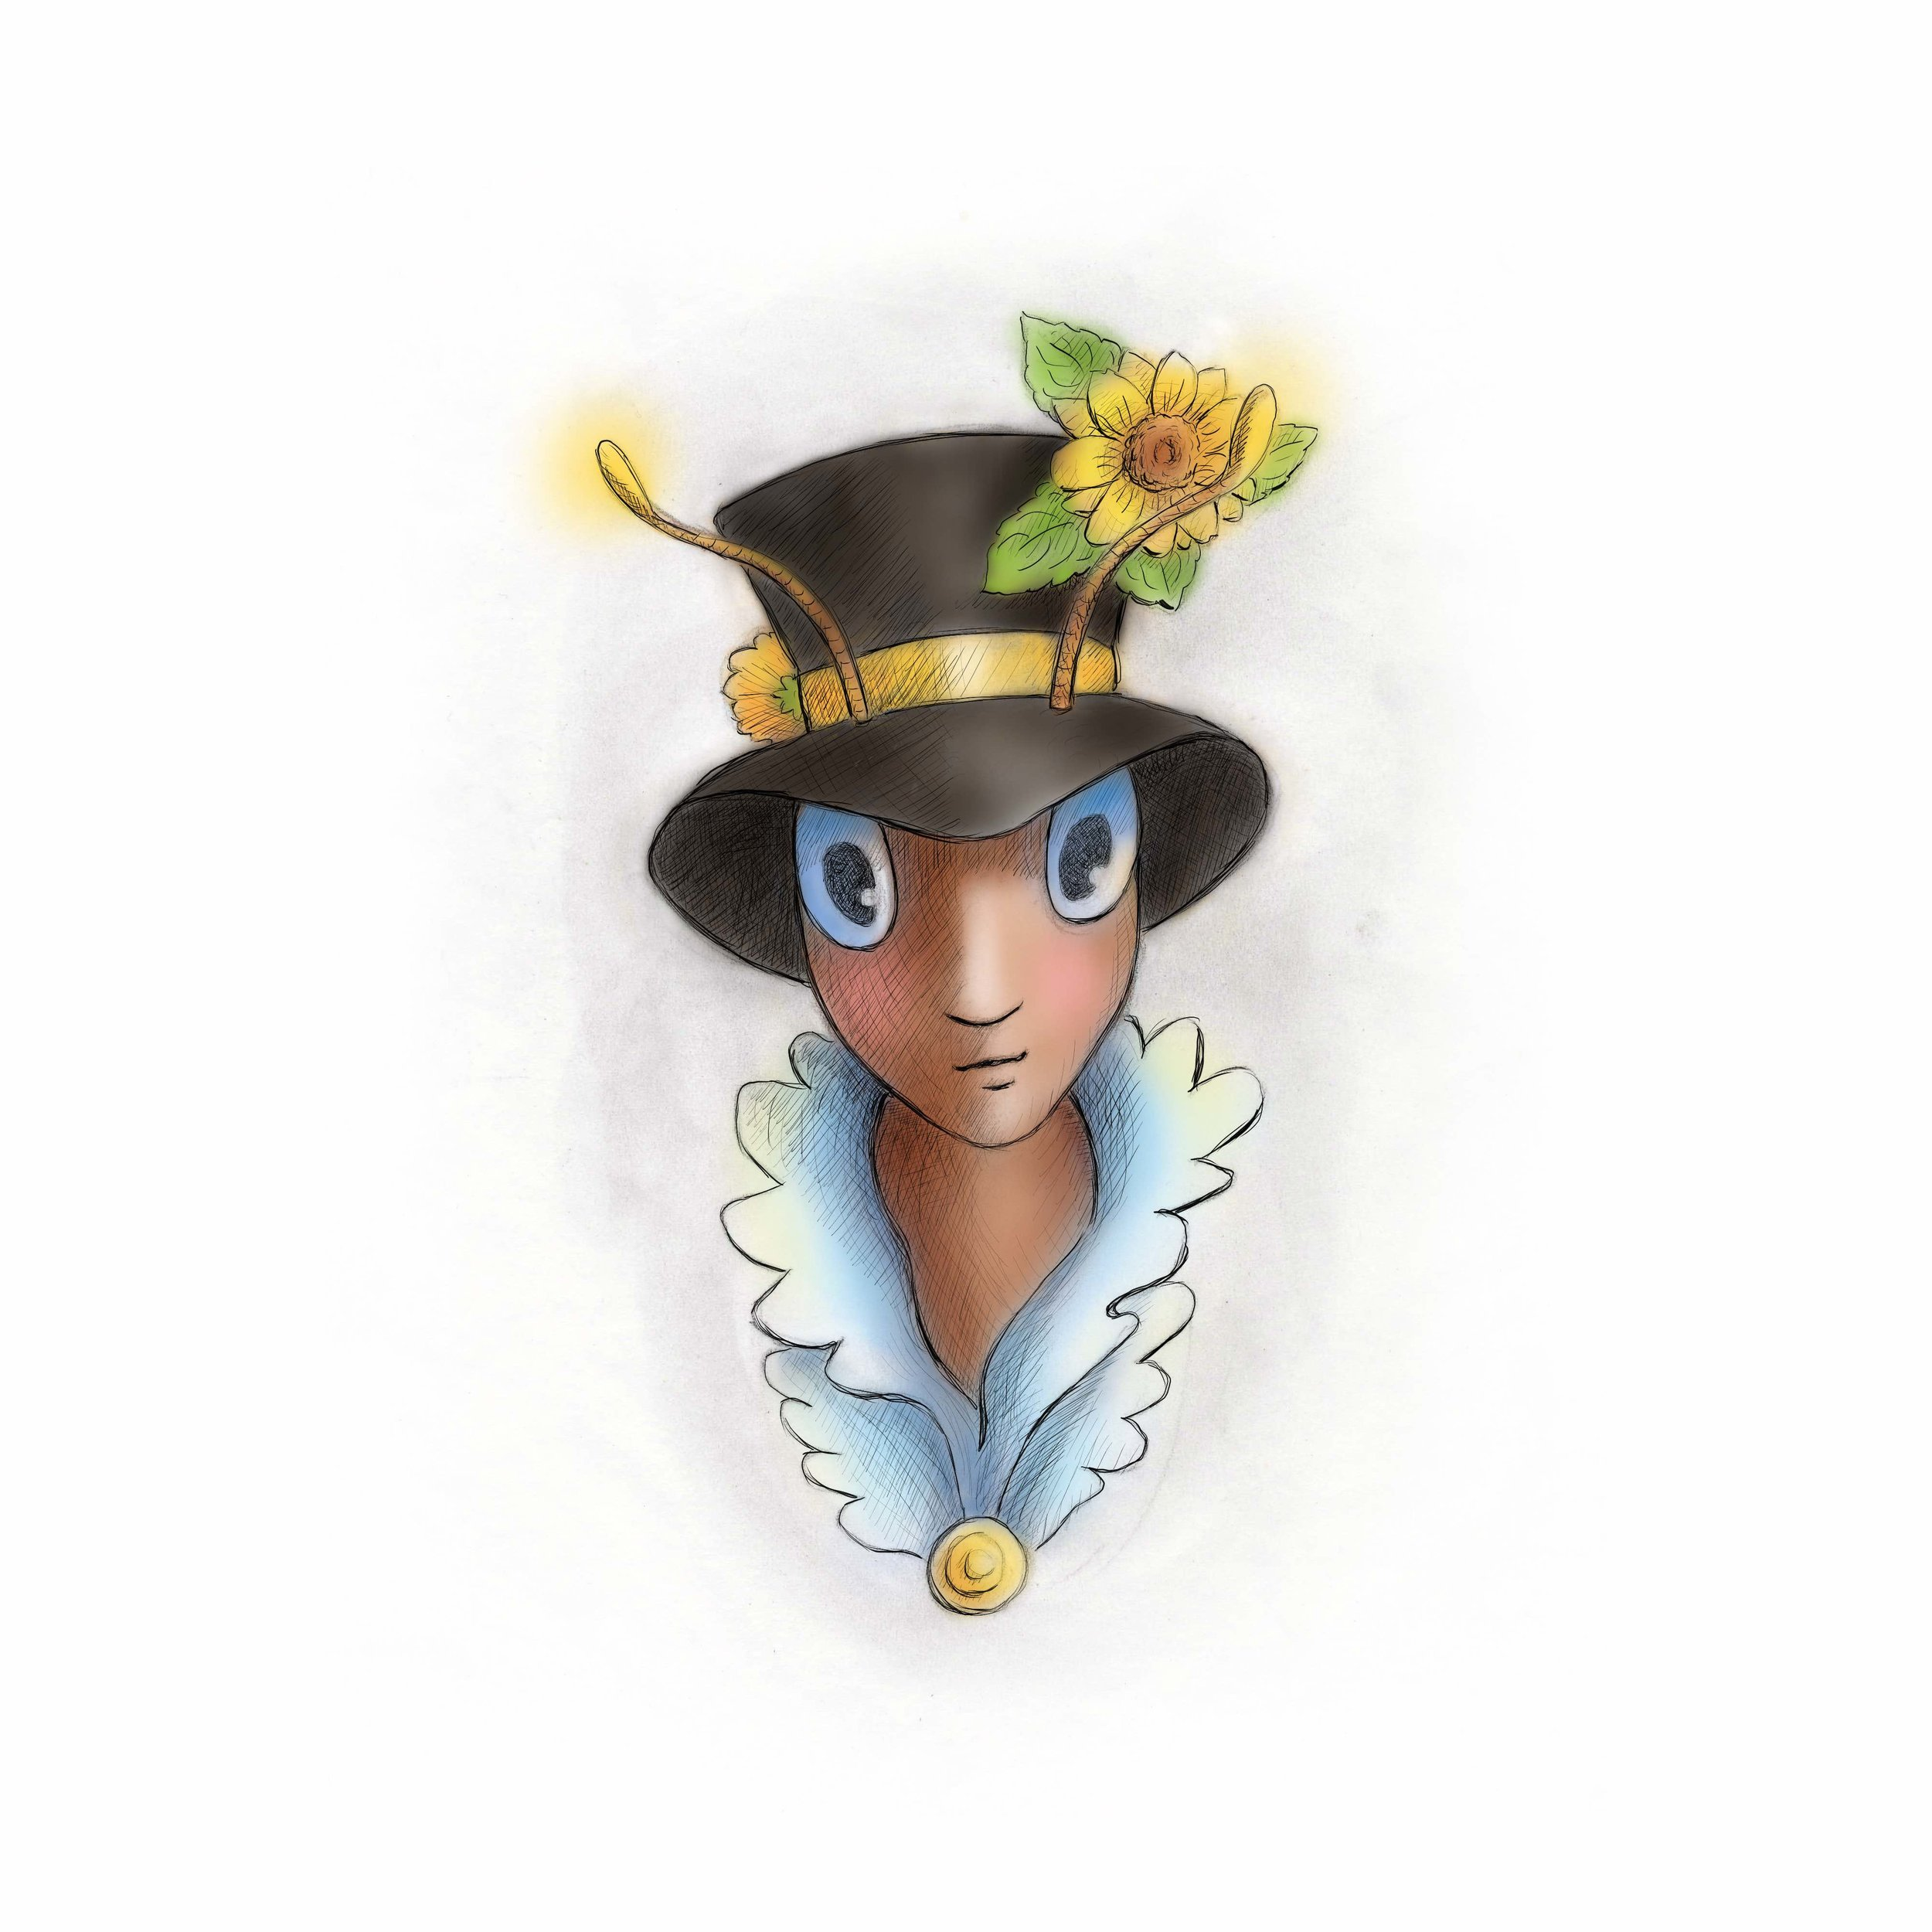 fashion bug with hat 6.jpeg